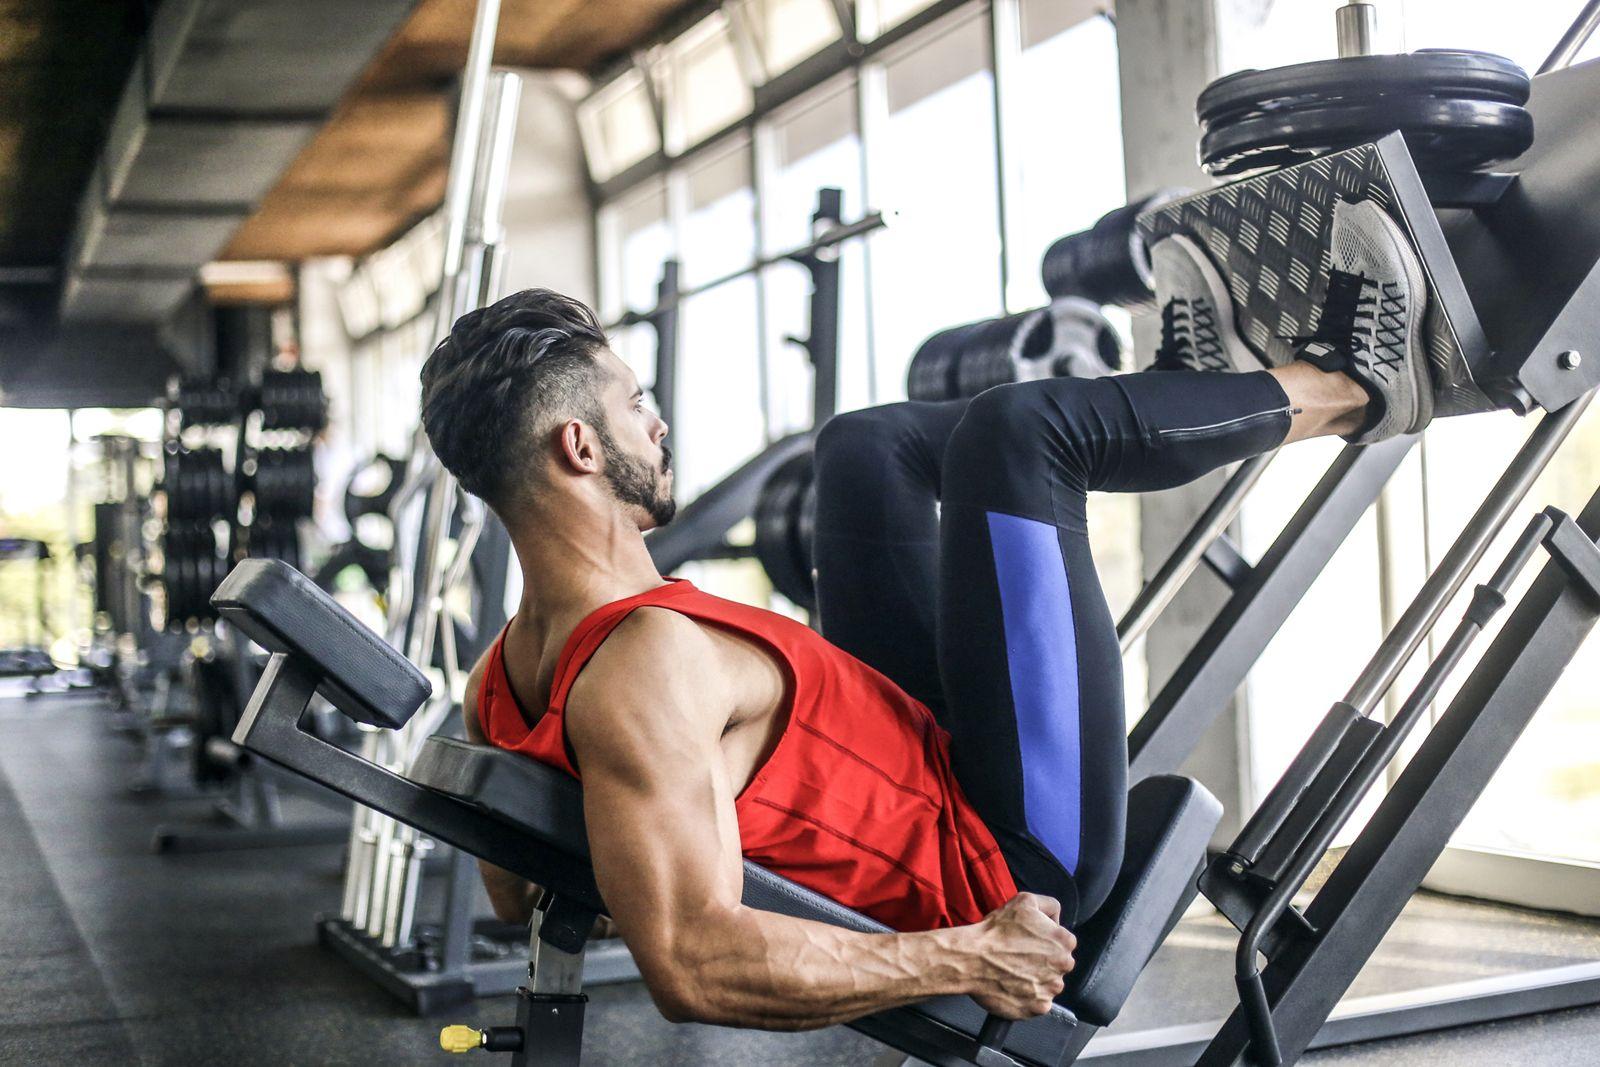 Maquinas gimnasio para fortalecer cuadriceps